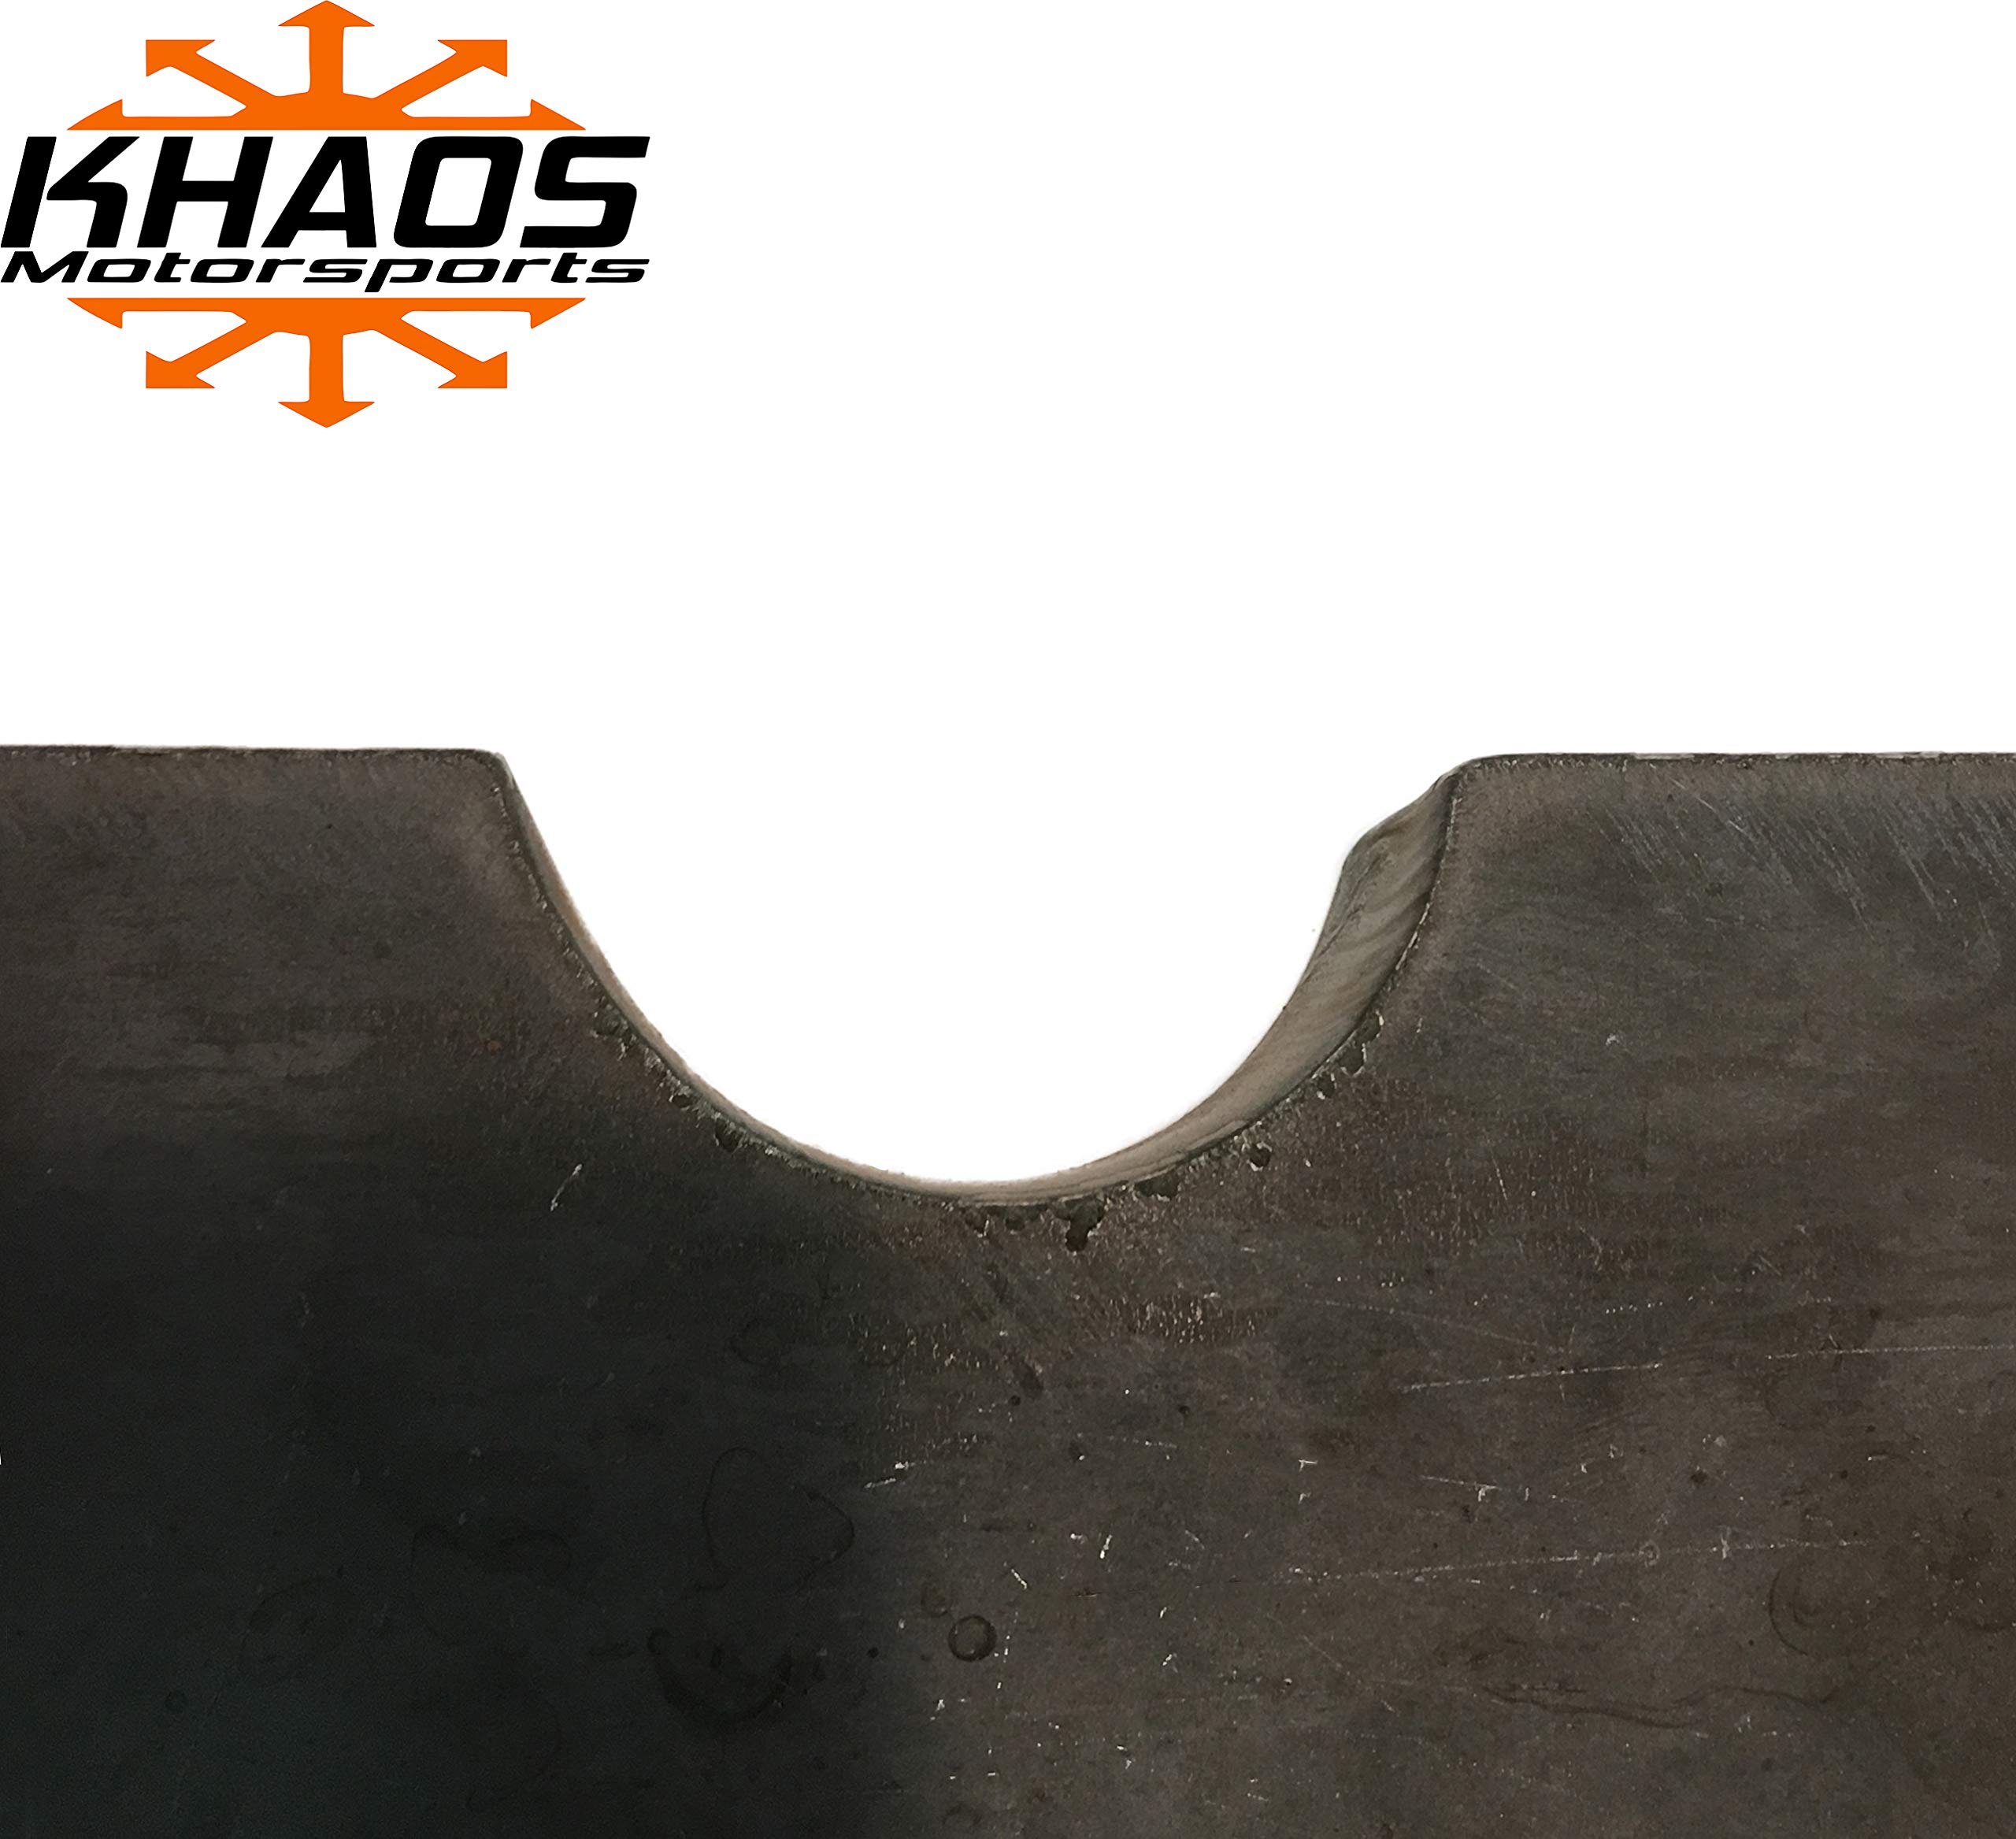 PRESS PLATES ARBOR PARALLELS 1''X8''X8'' SET by Khaos Motorsports (Image #3)